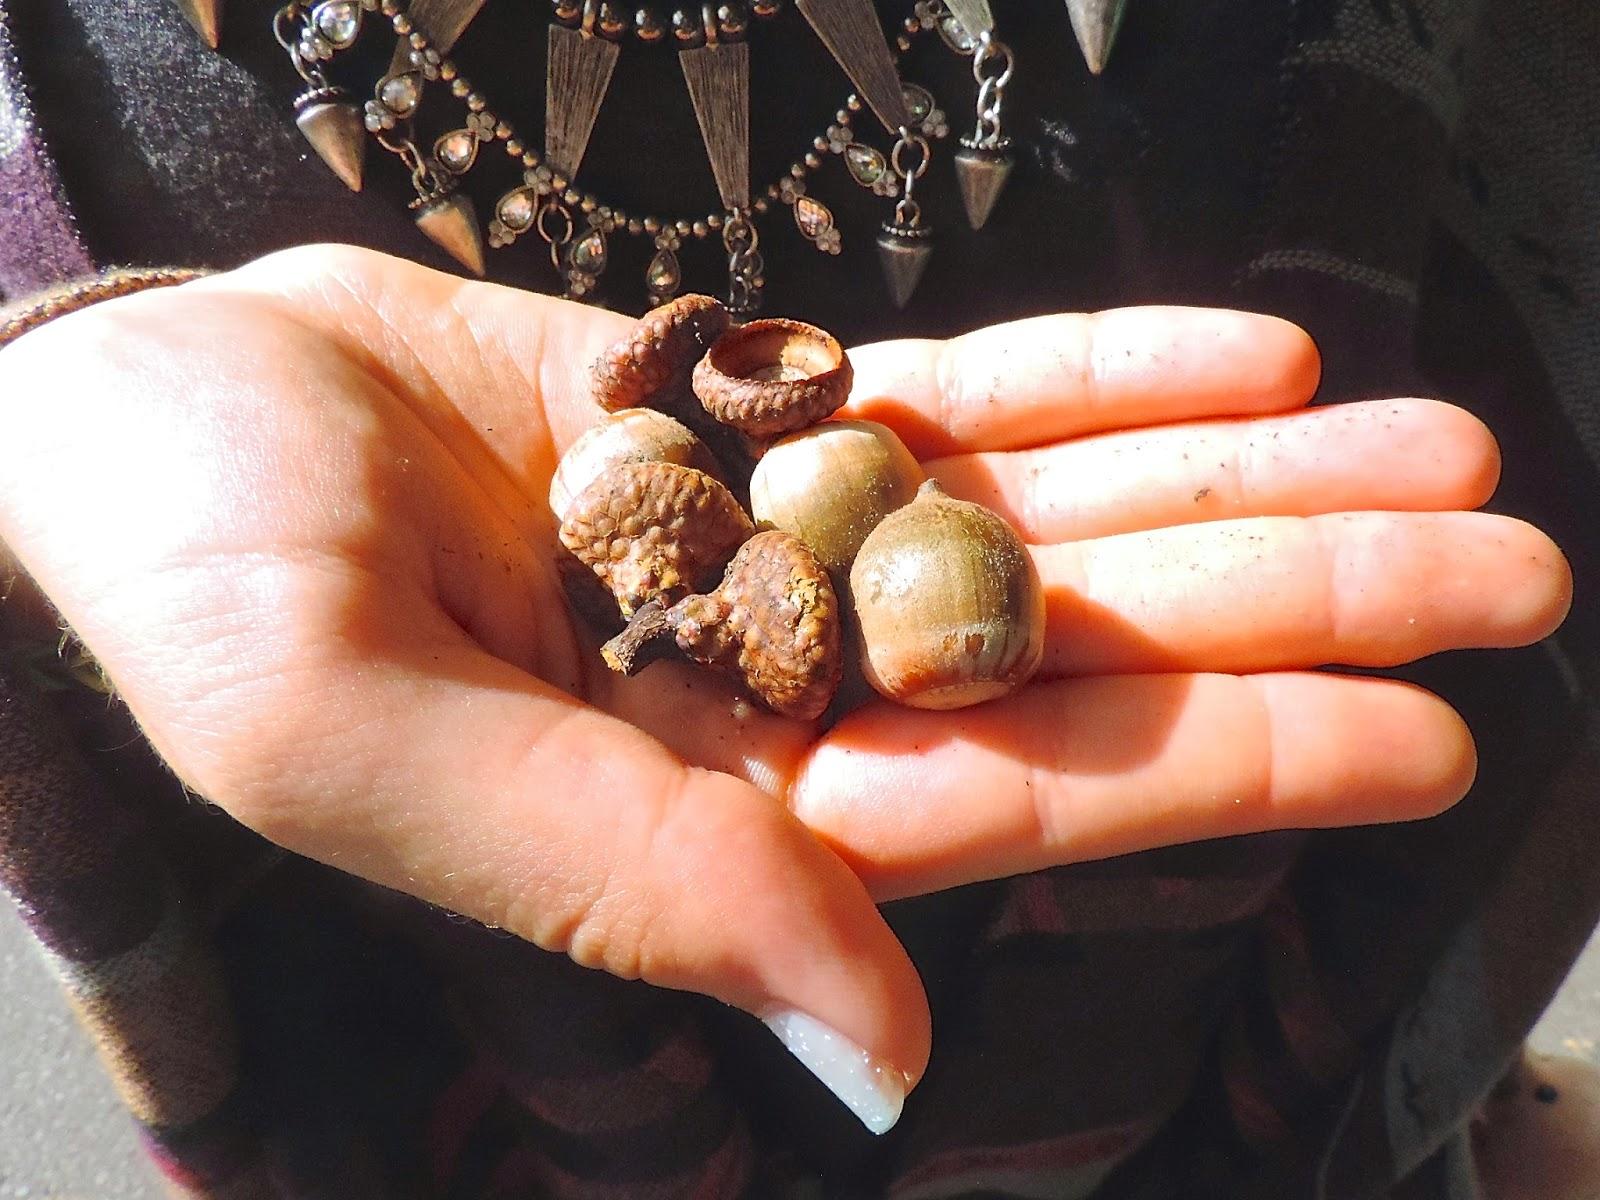 Nuts macro shot